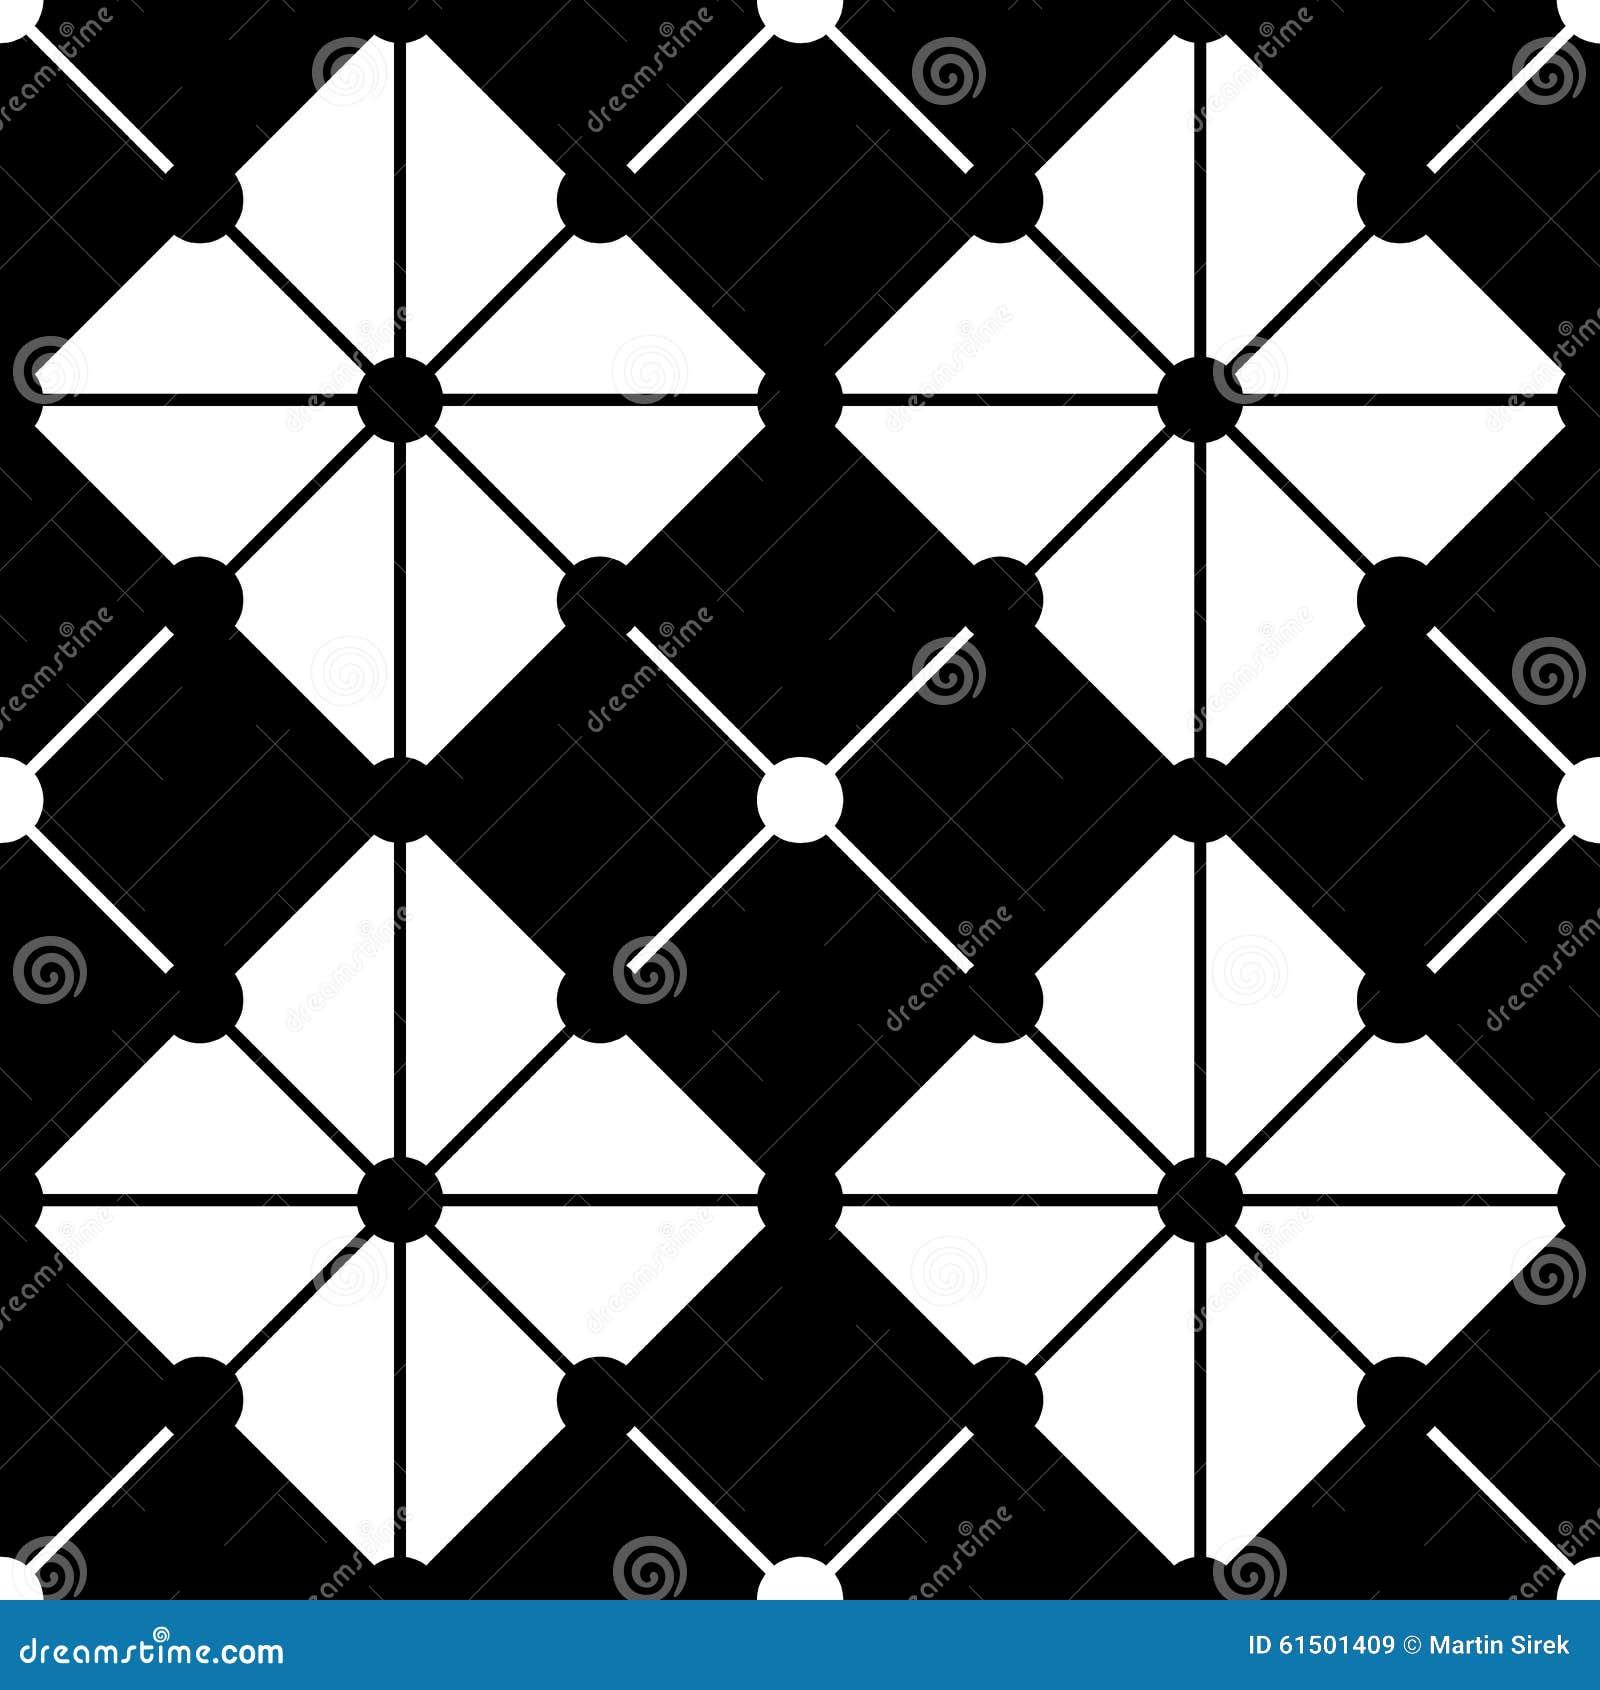 Vector modern seamless geometry pattern cross tiles black for Modern patterns black and white